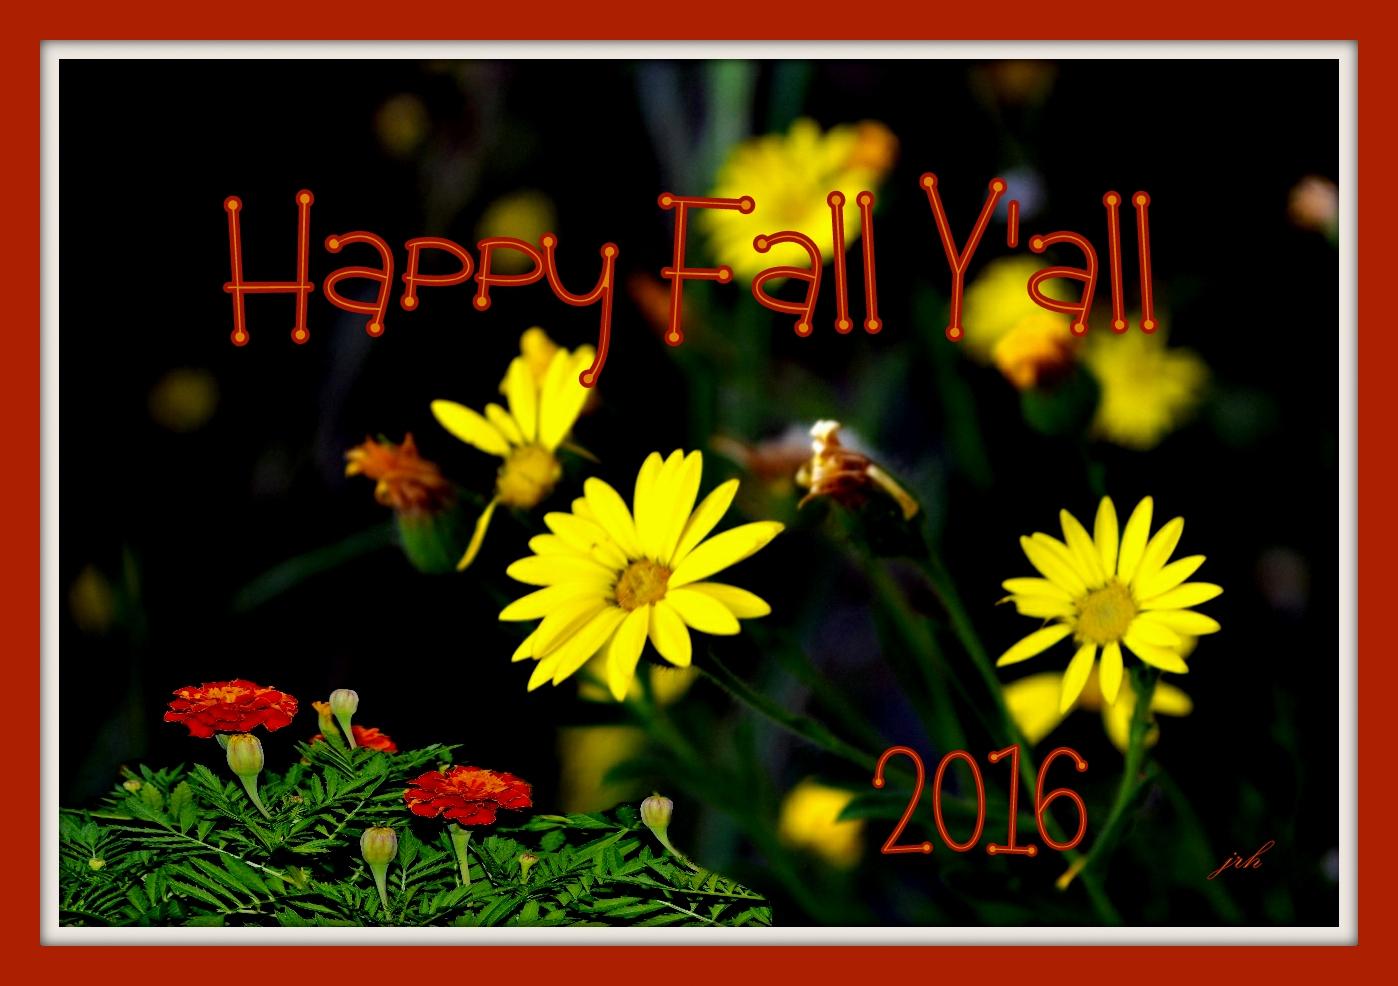 happy-fall-yall-2016-card